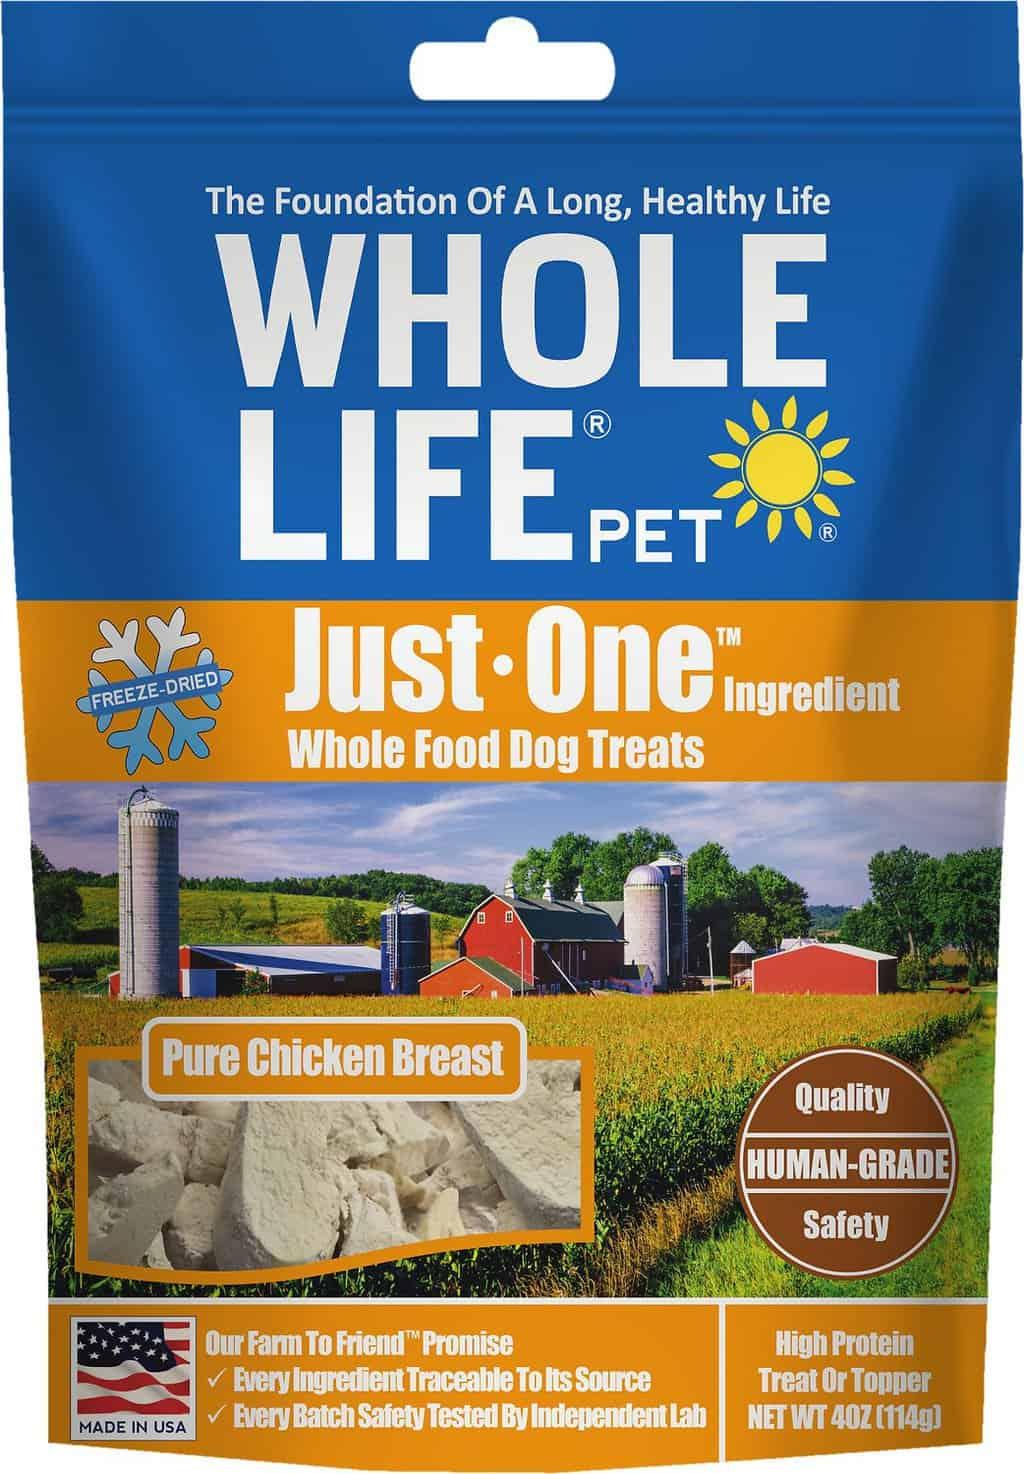 Whole Life Dog Food: 2020 Reviews, Recalls & Coupons 3